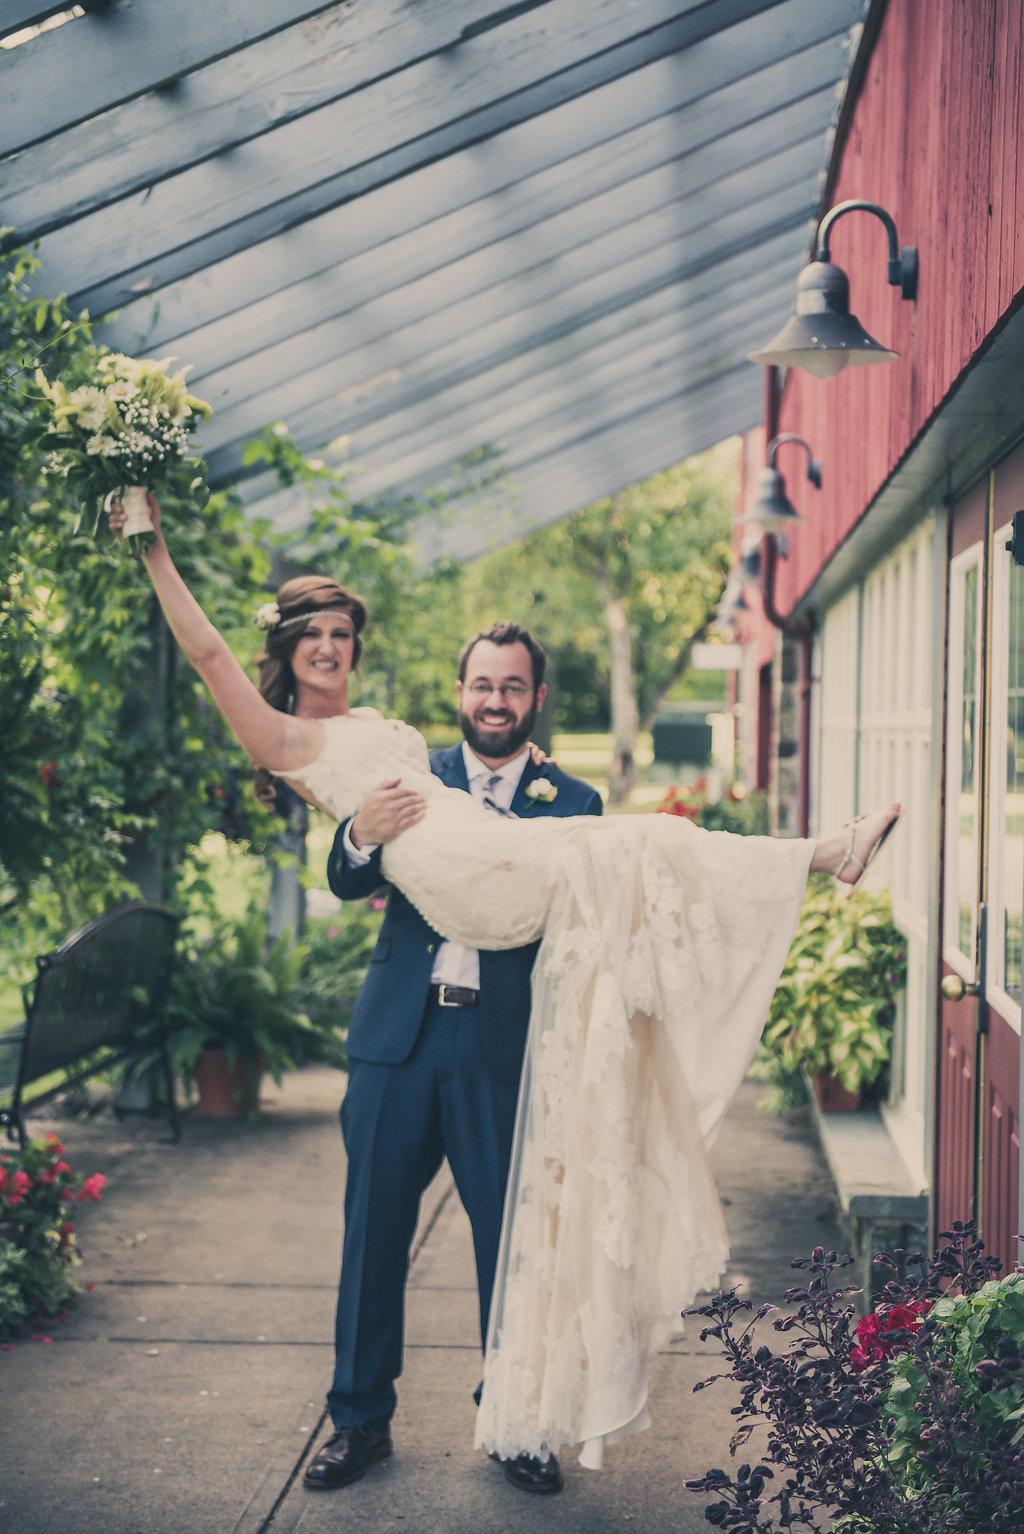 pearl-s-buck-wedding-celebration